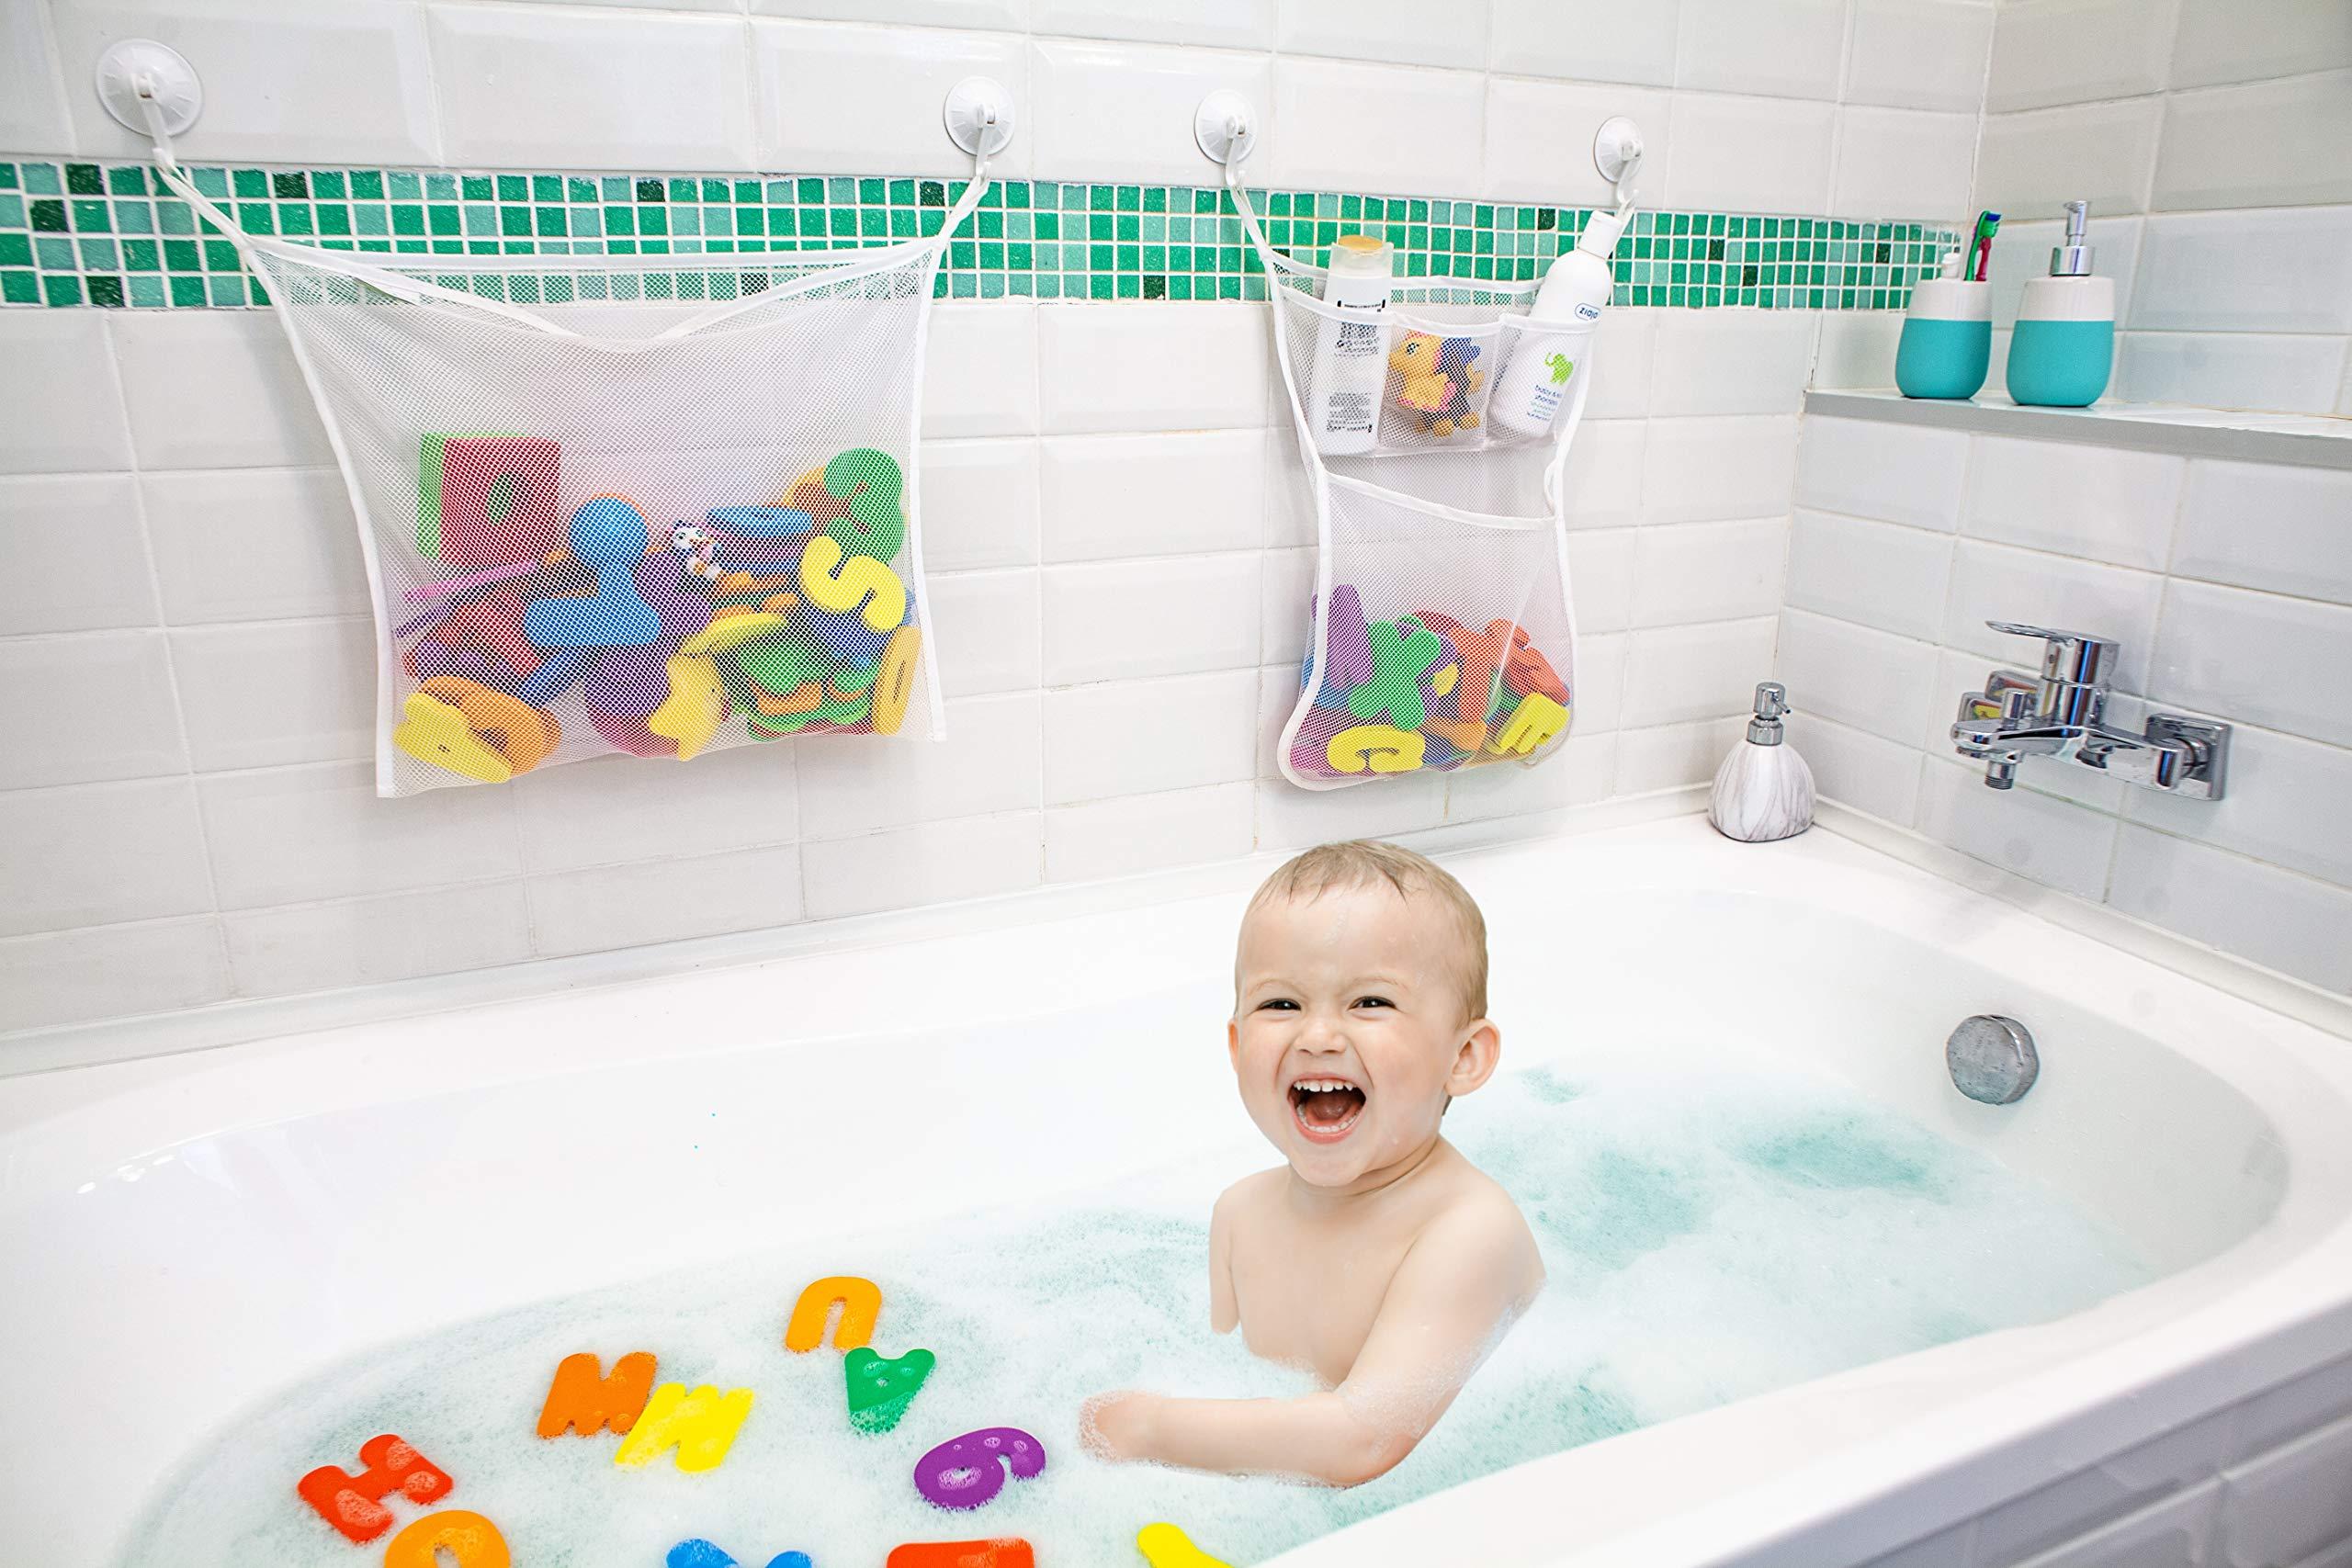 2 Bath Toy Organizer Kids Bathtub Multipurpose Mesh Storage Bags 6 Strong Hooks